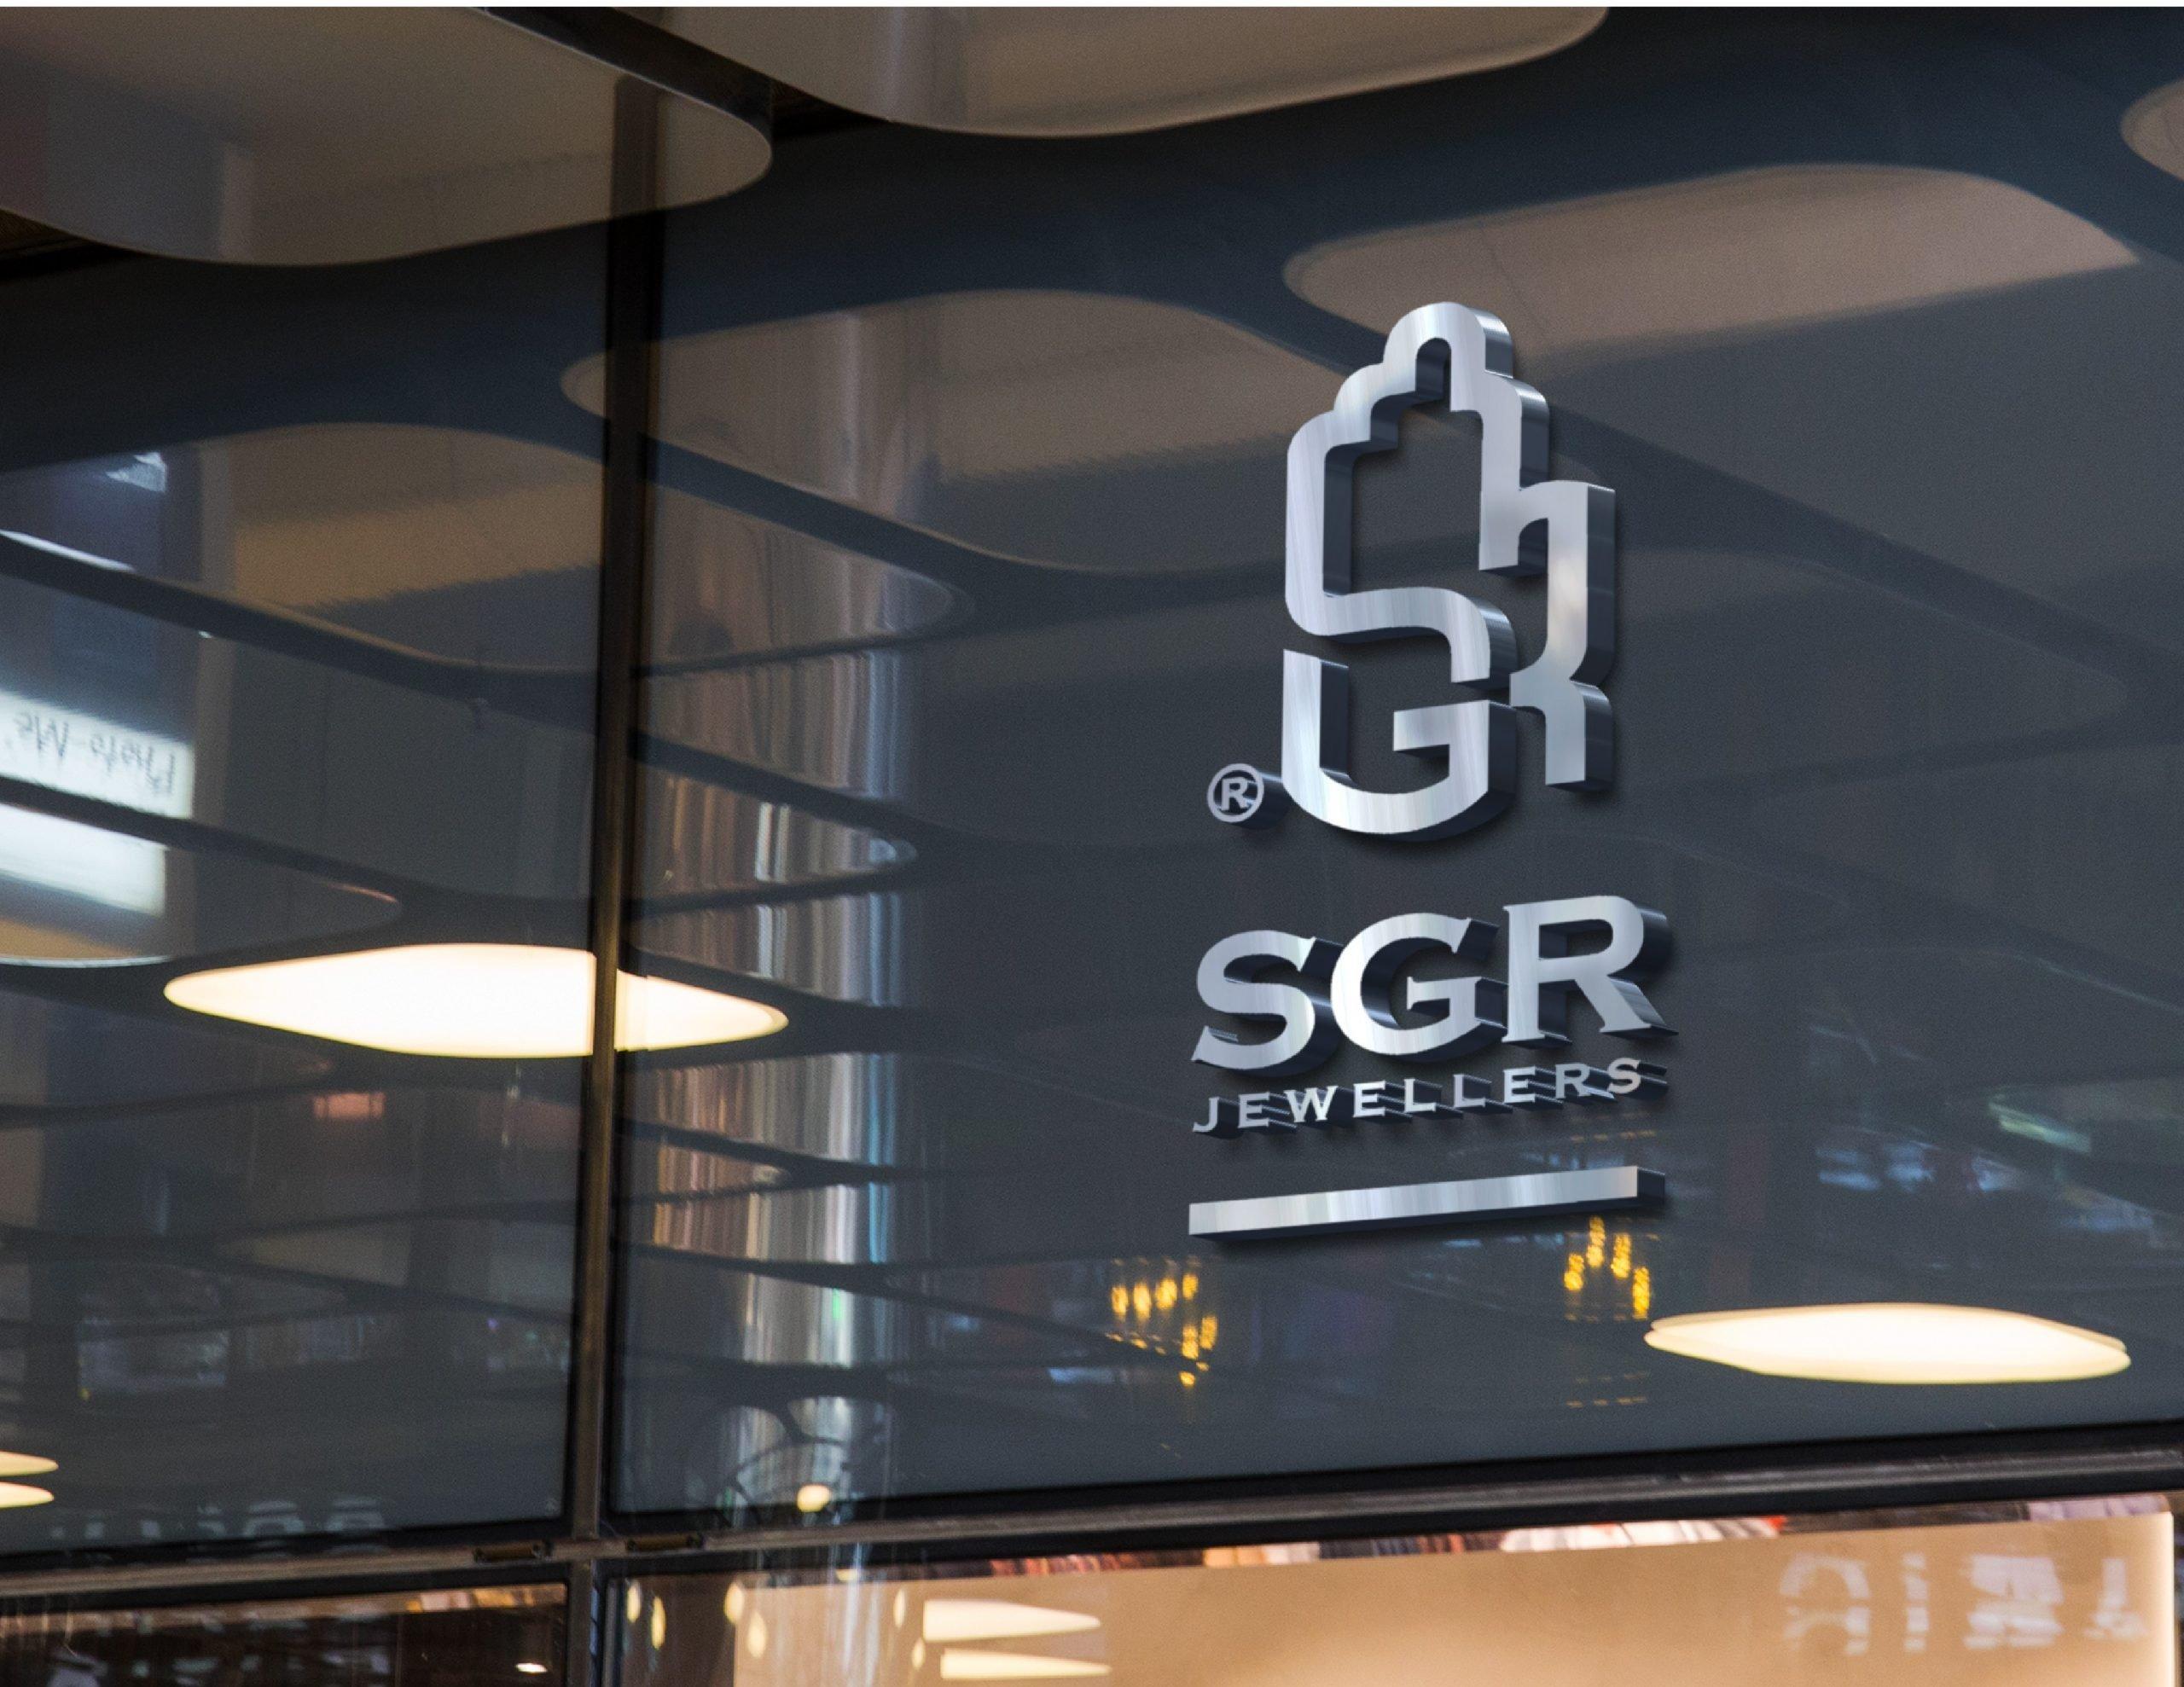 SGR Jewelers